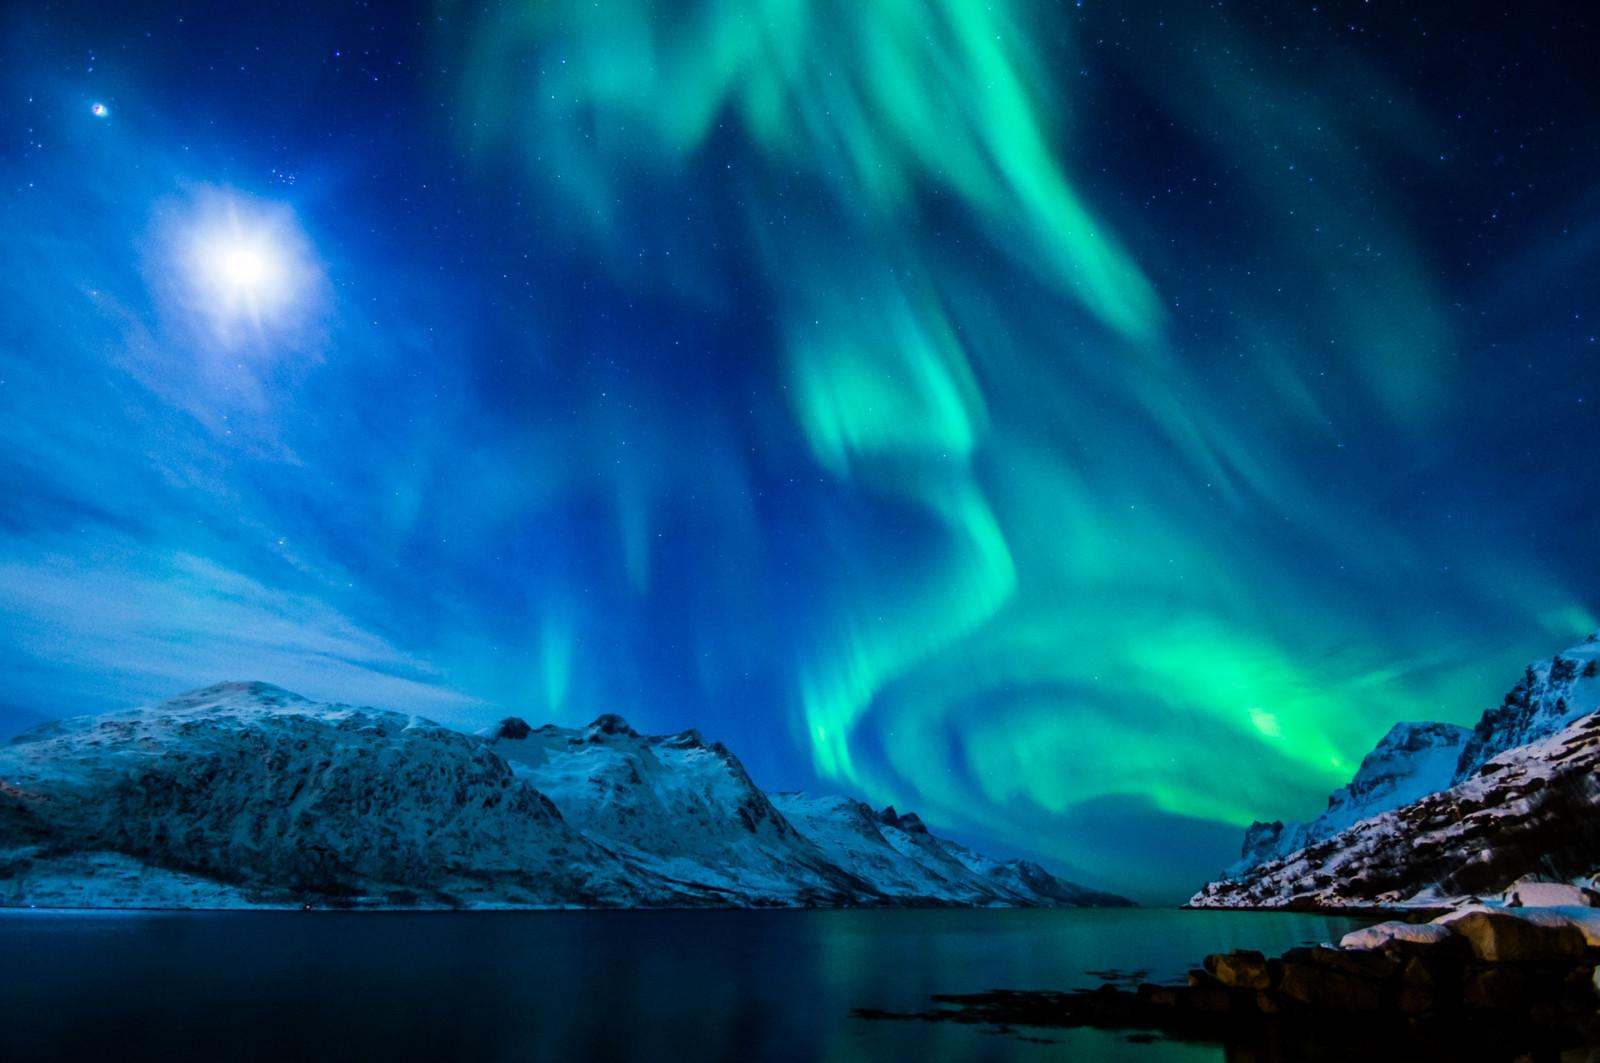 Wallpaper : northern lights, aurora borealis, UK, 2015 ...